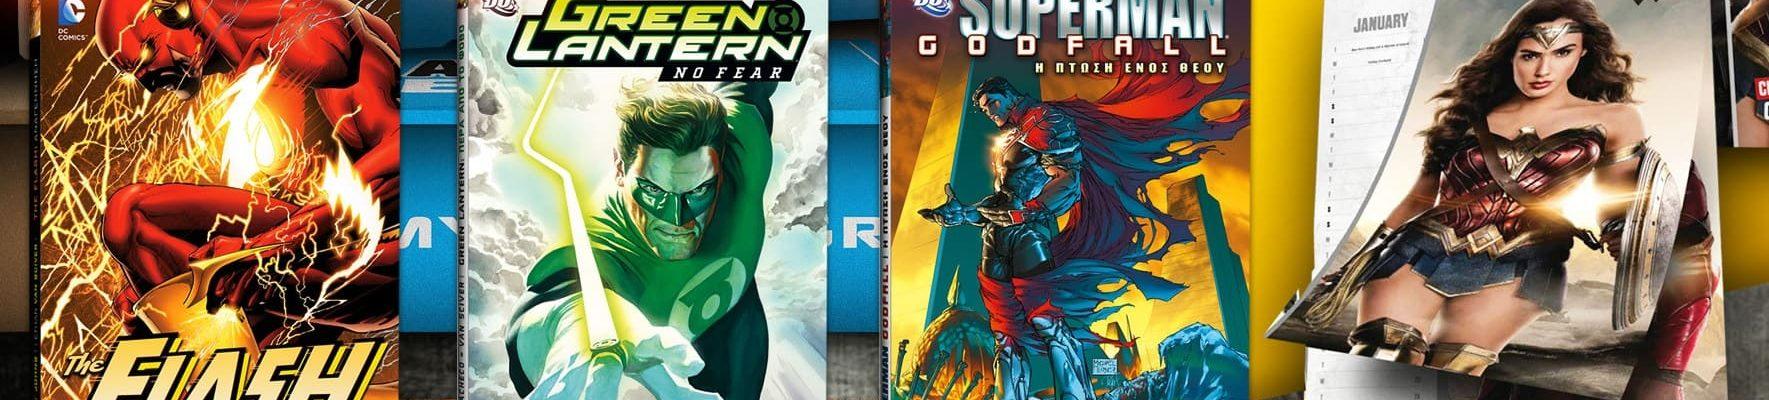 DC Heroes Box Digital Content